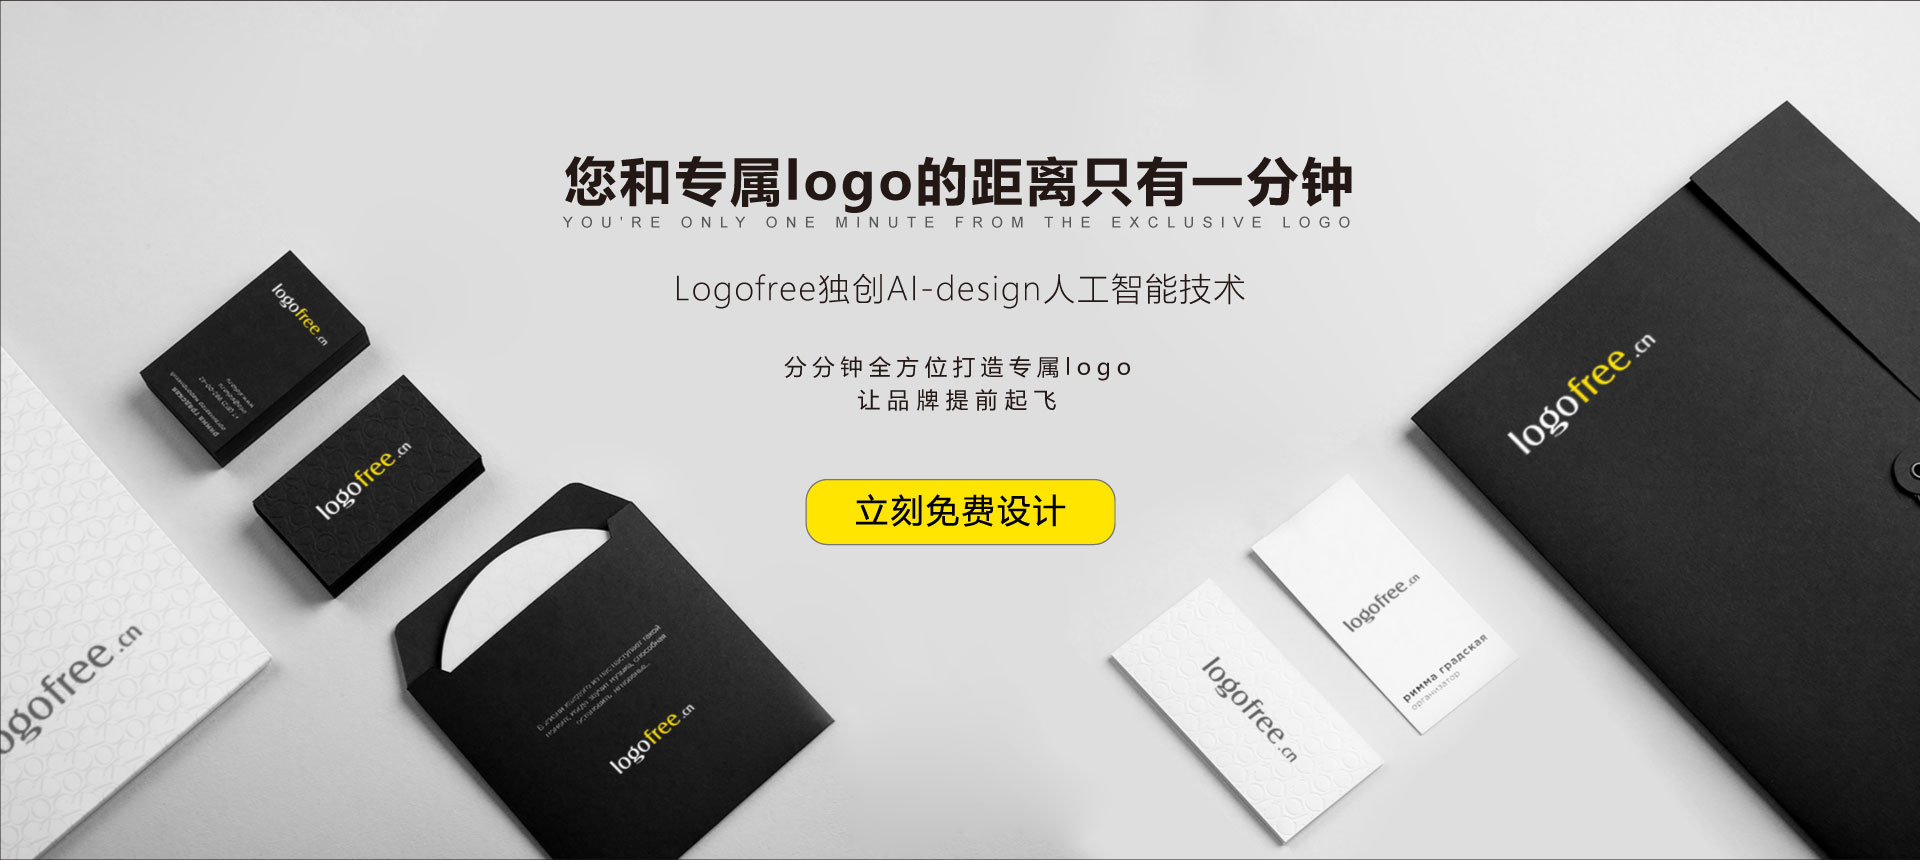 logofree,logo在线制作生成器